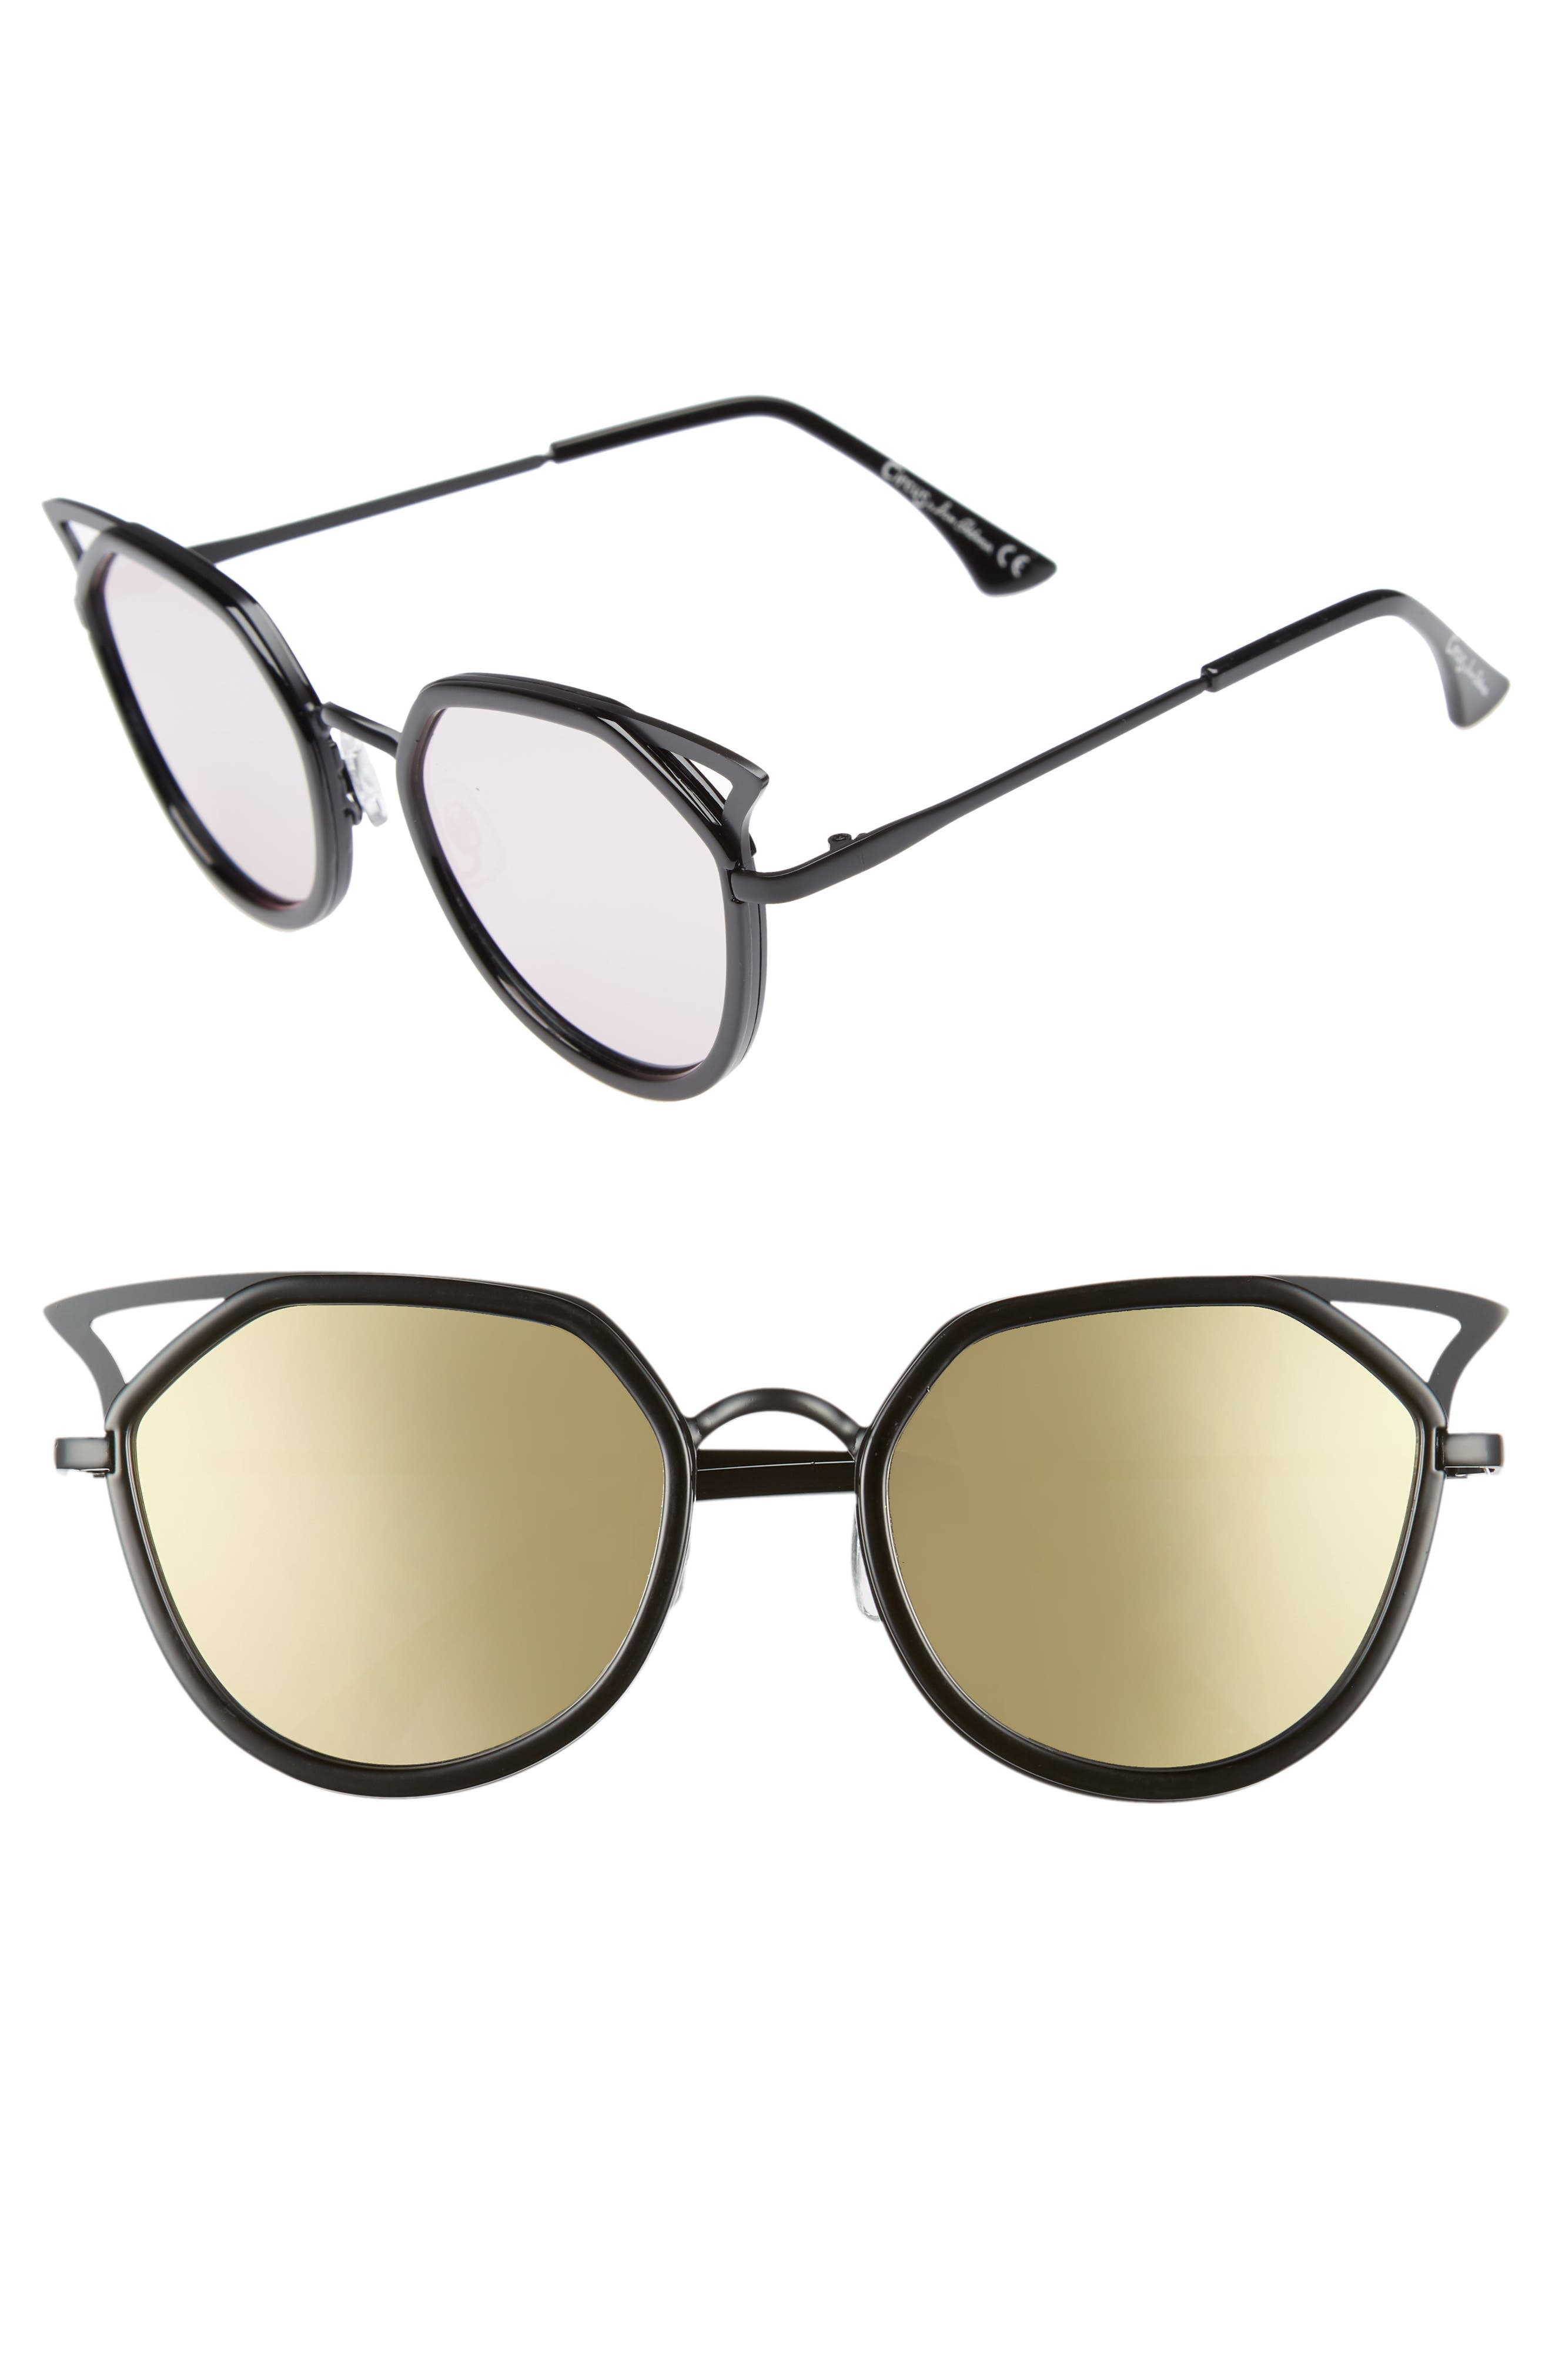 Satellite 60mm Cat Eye Sunglasses,                             Main thumbnail 1, color,                             001